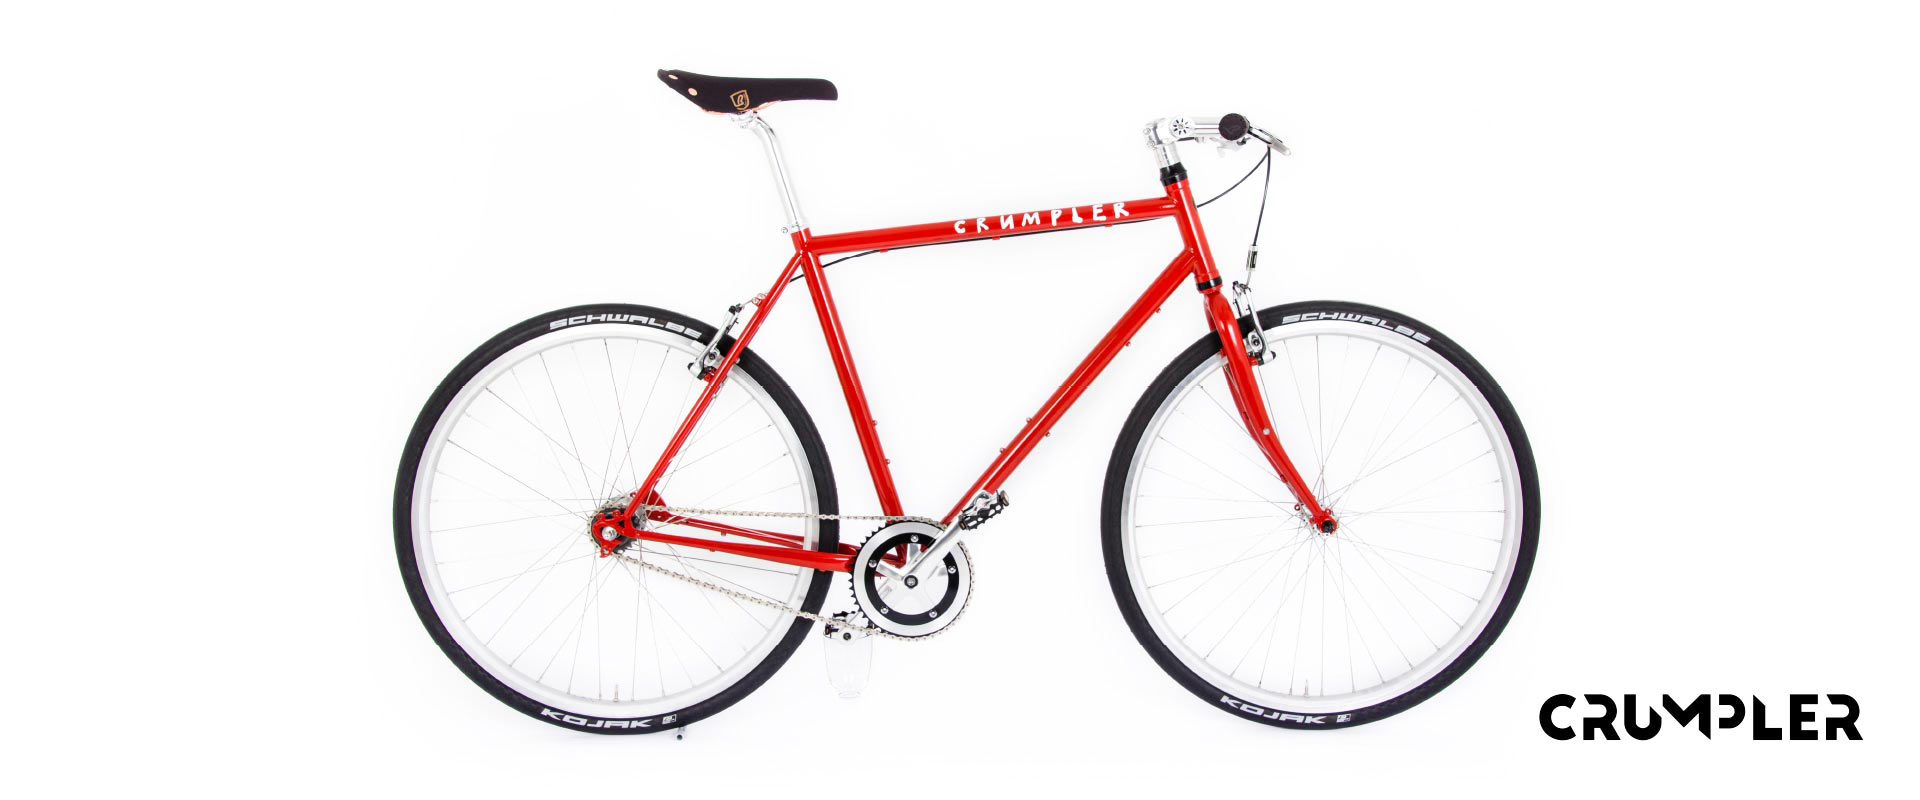 Crumpler Schaufenster-Fahrrad